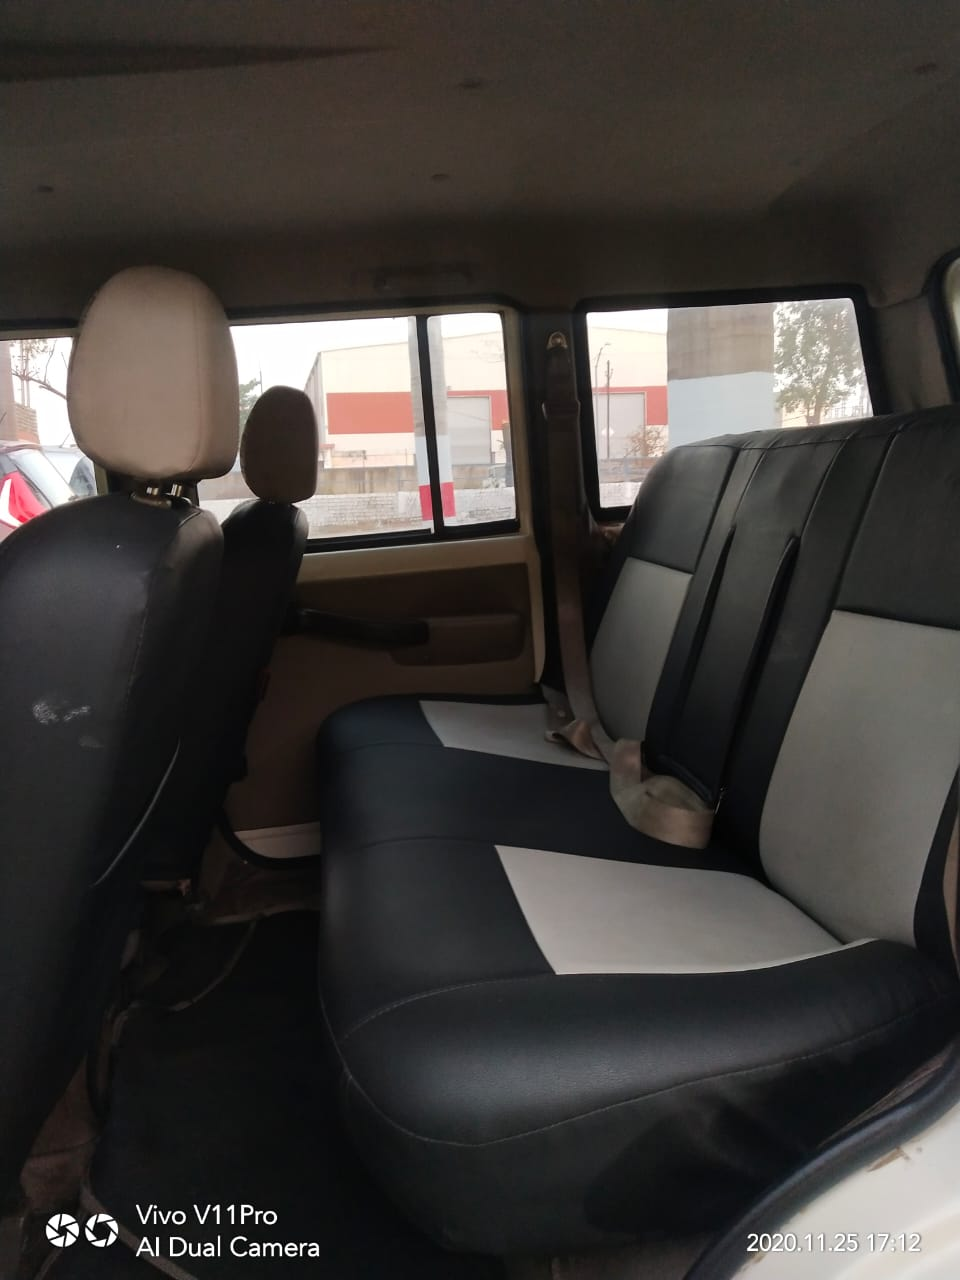 Back_seats 20201125183757